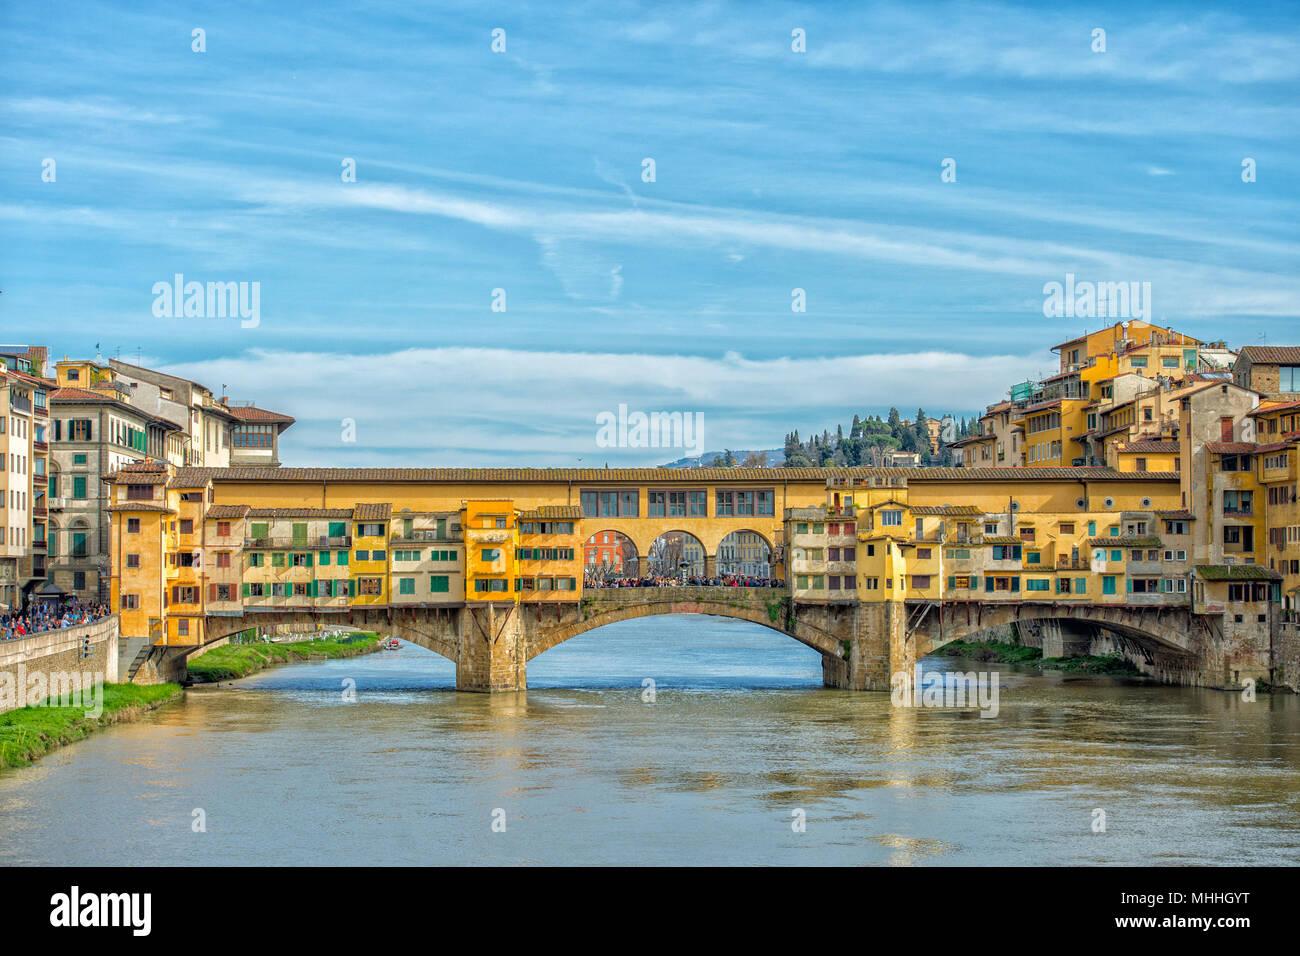 Florence Ponte Vecchio bridge view cityscape - Stock Image